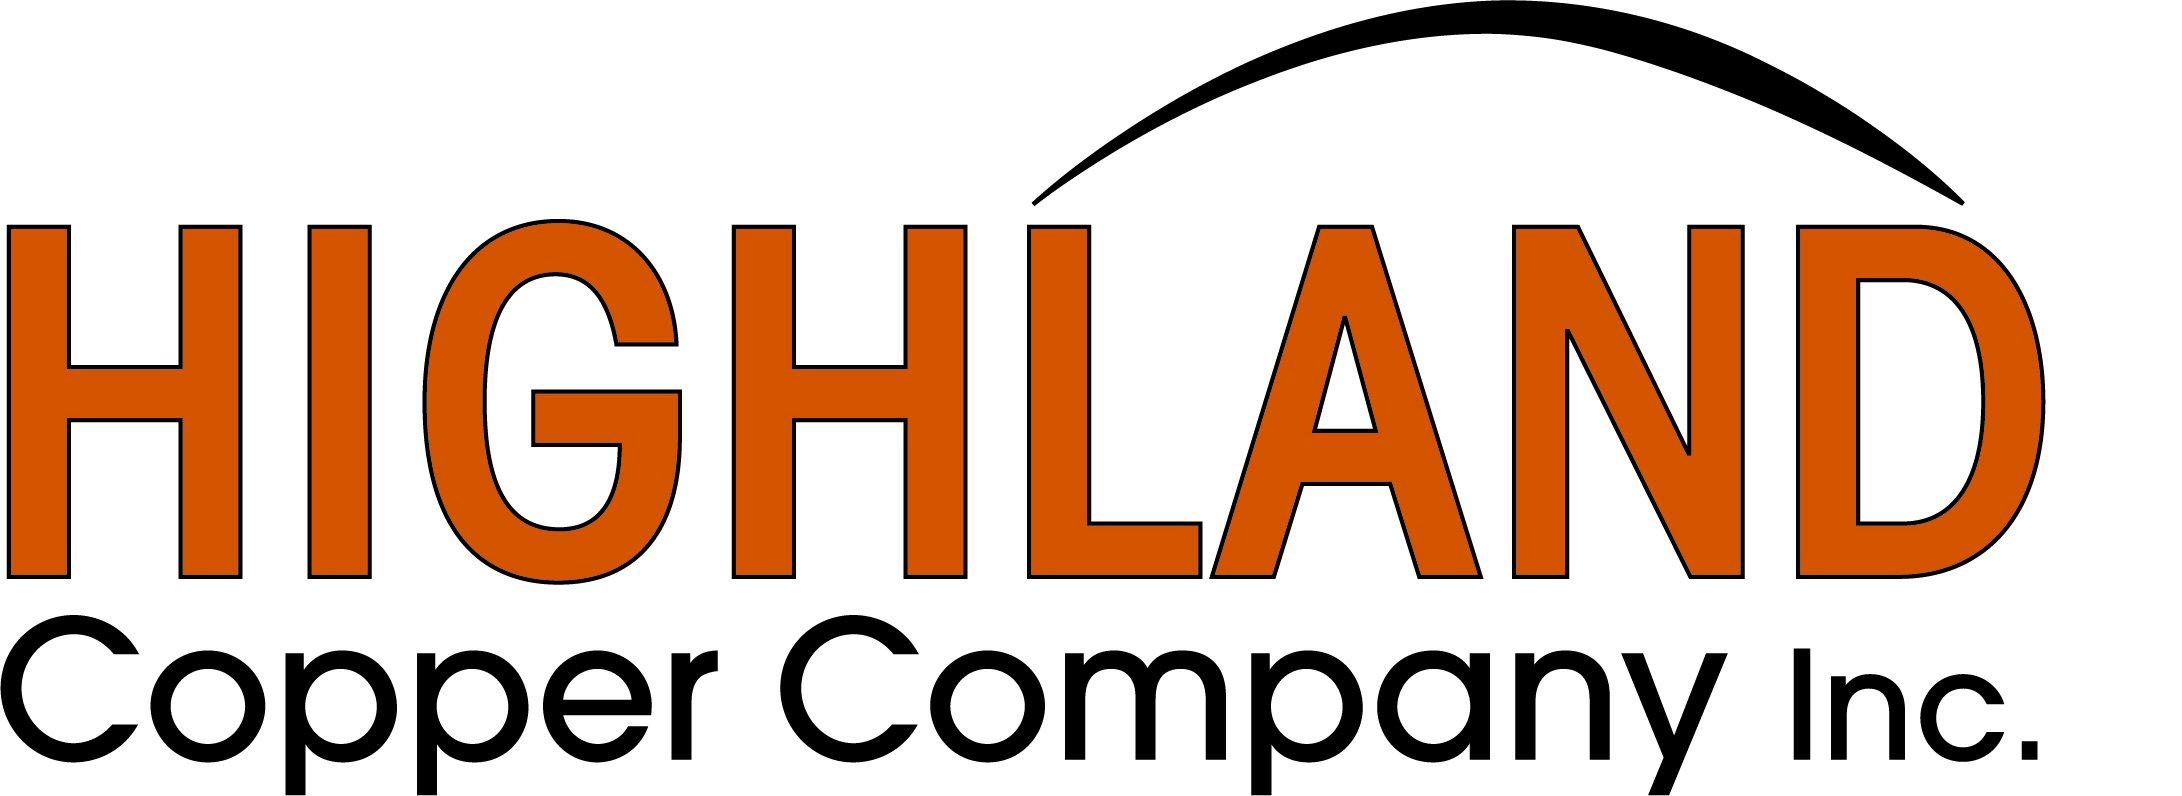 Highland Copper Provides Corporate Update